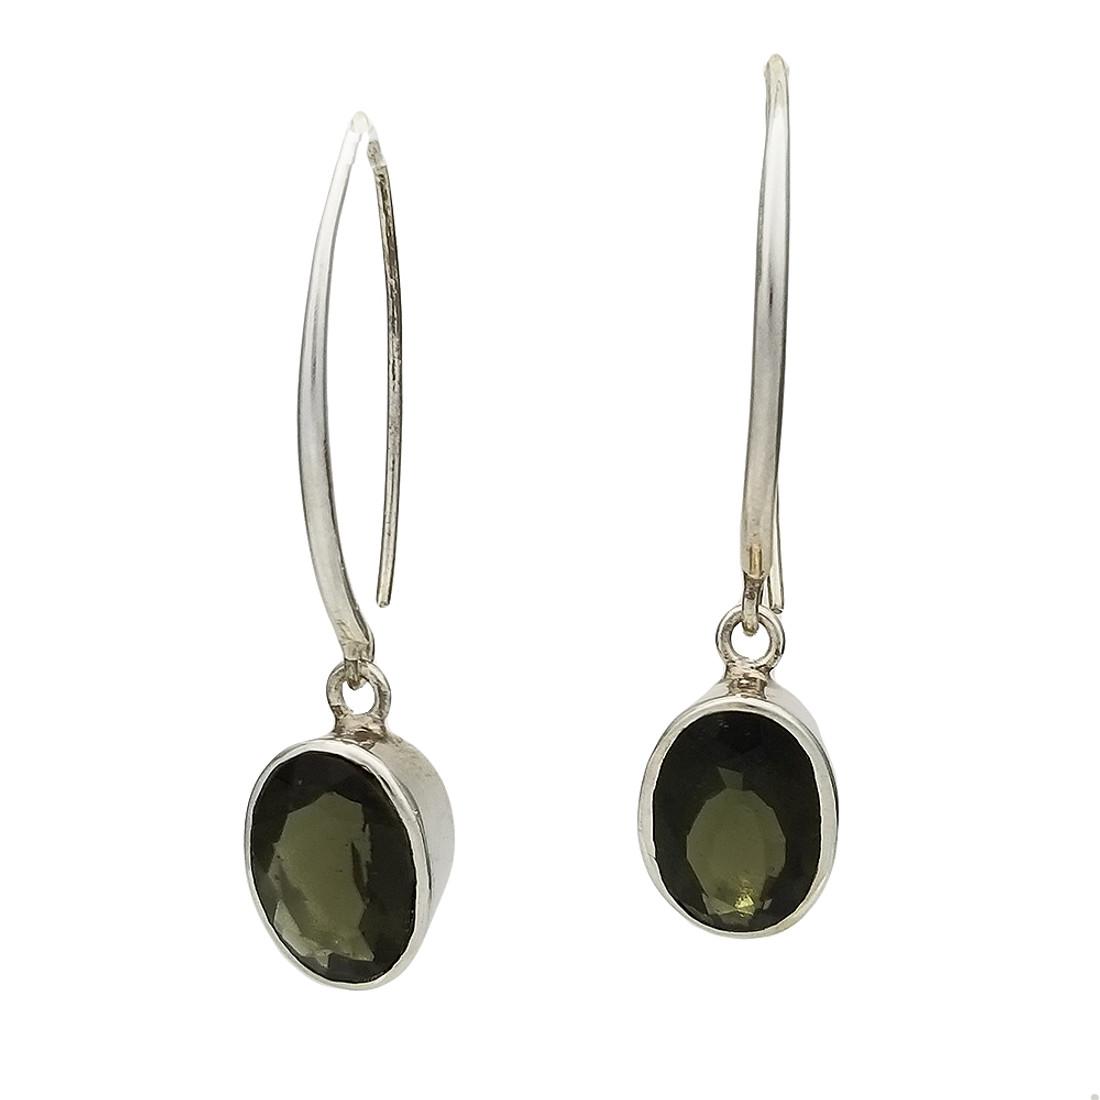 Faceted high quality Moldavite dangle sterling silver earrings.